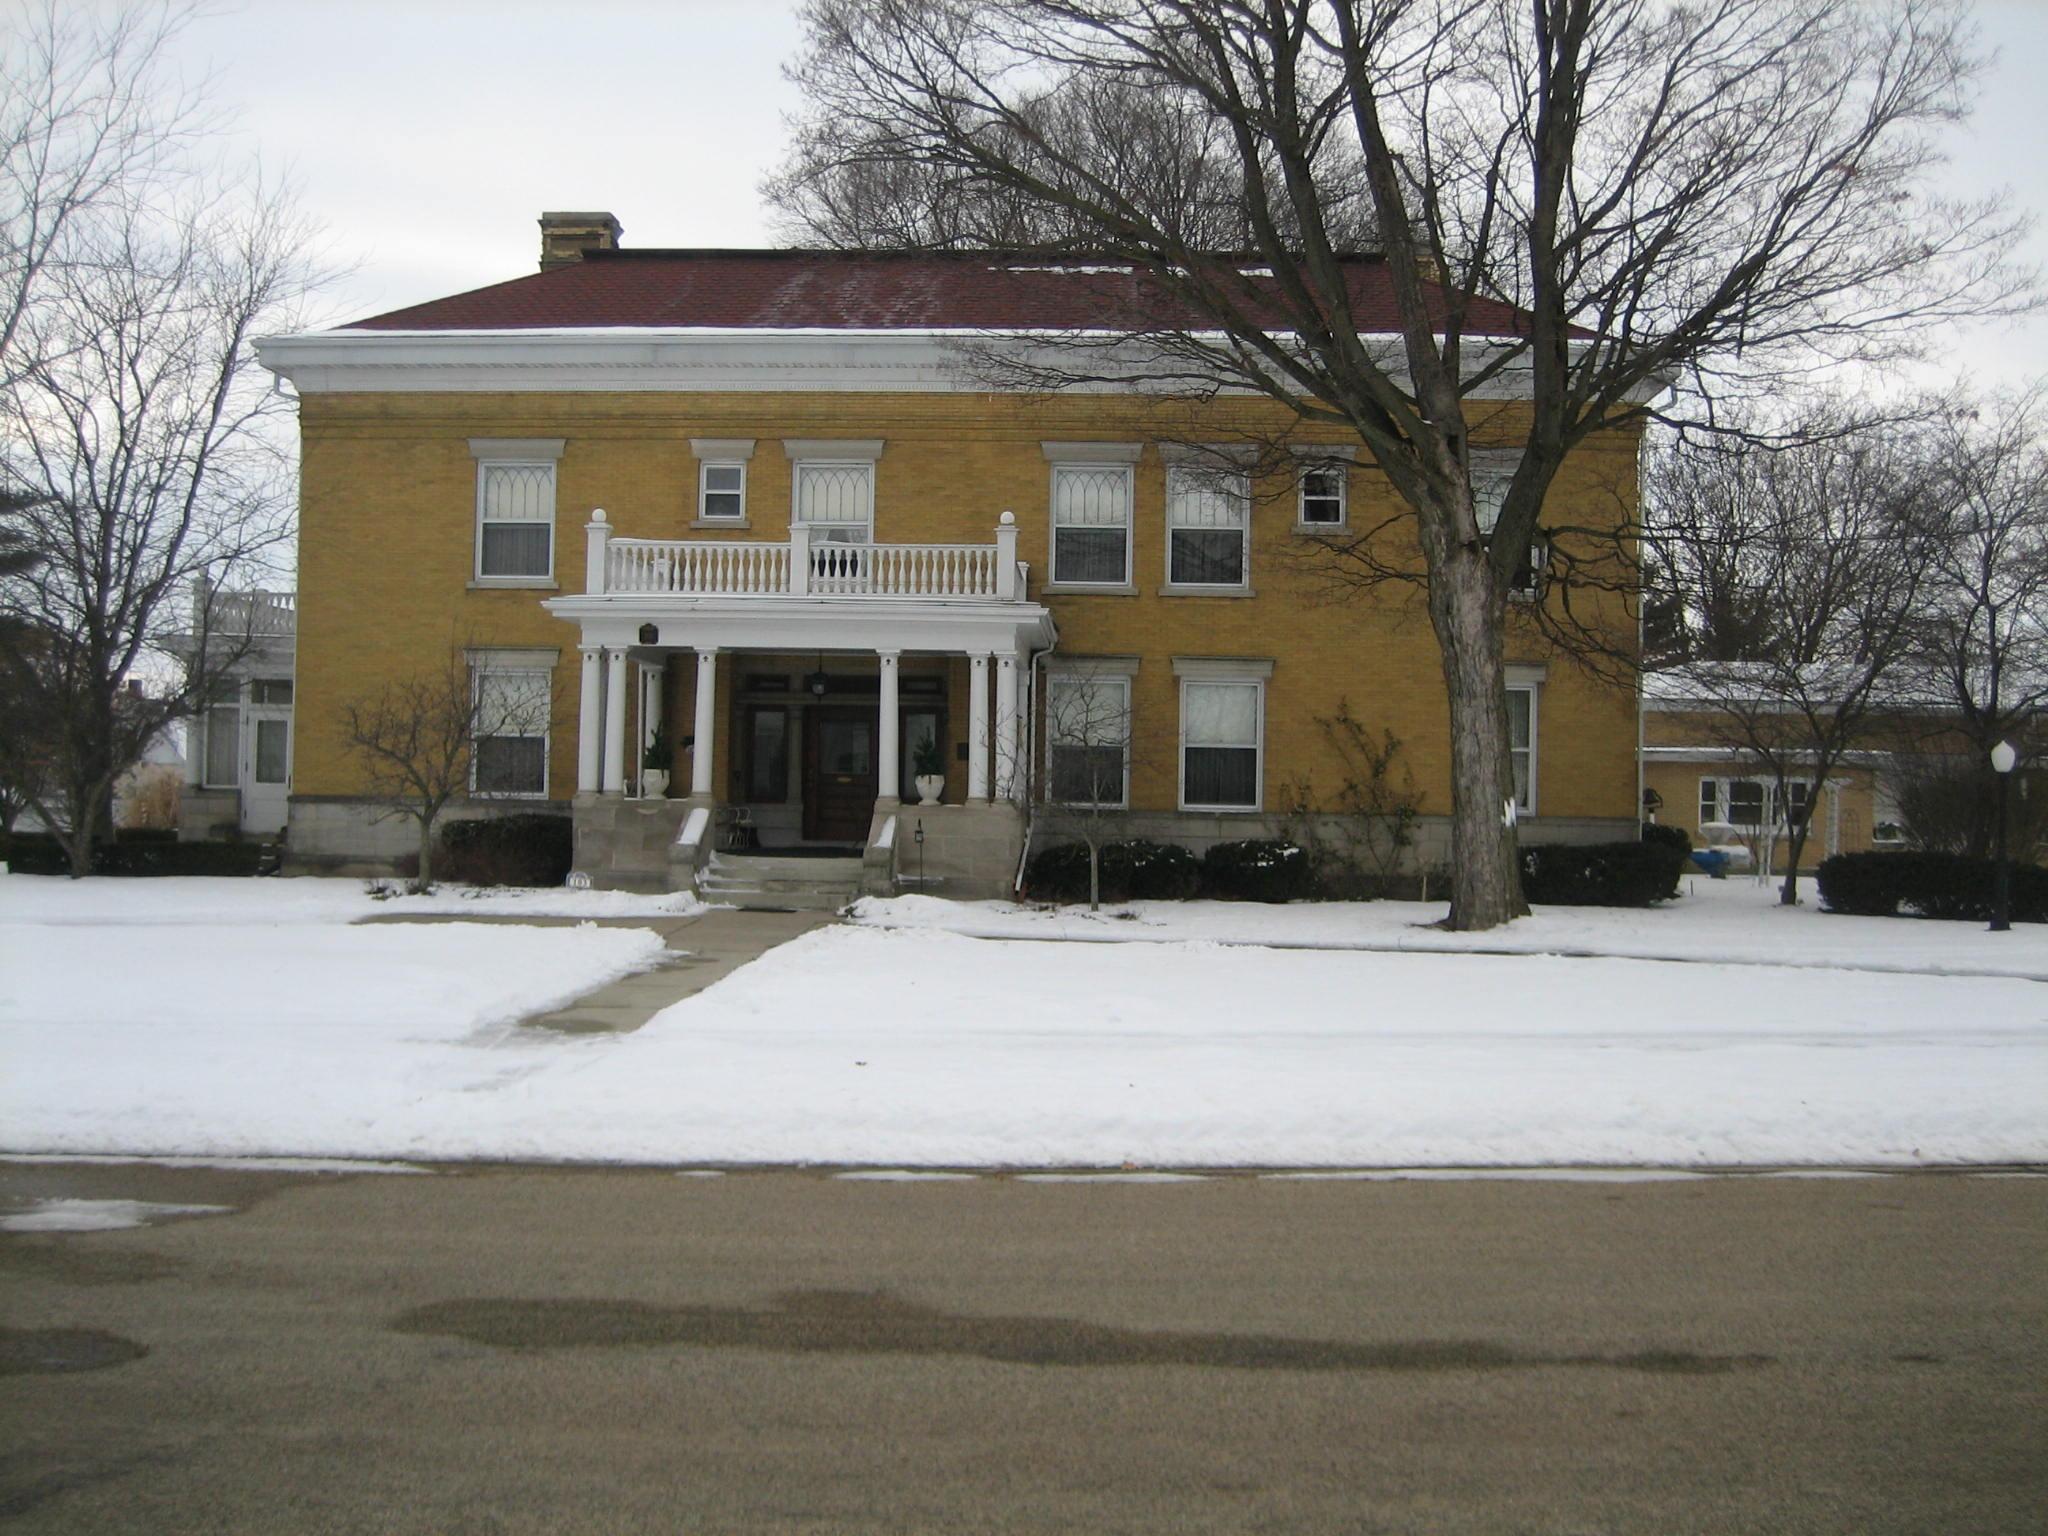 Illinois ogle county polo - File Ogle County Polo Il B And L Barber House4 Jpg